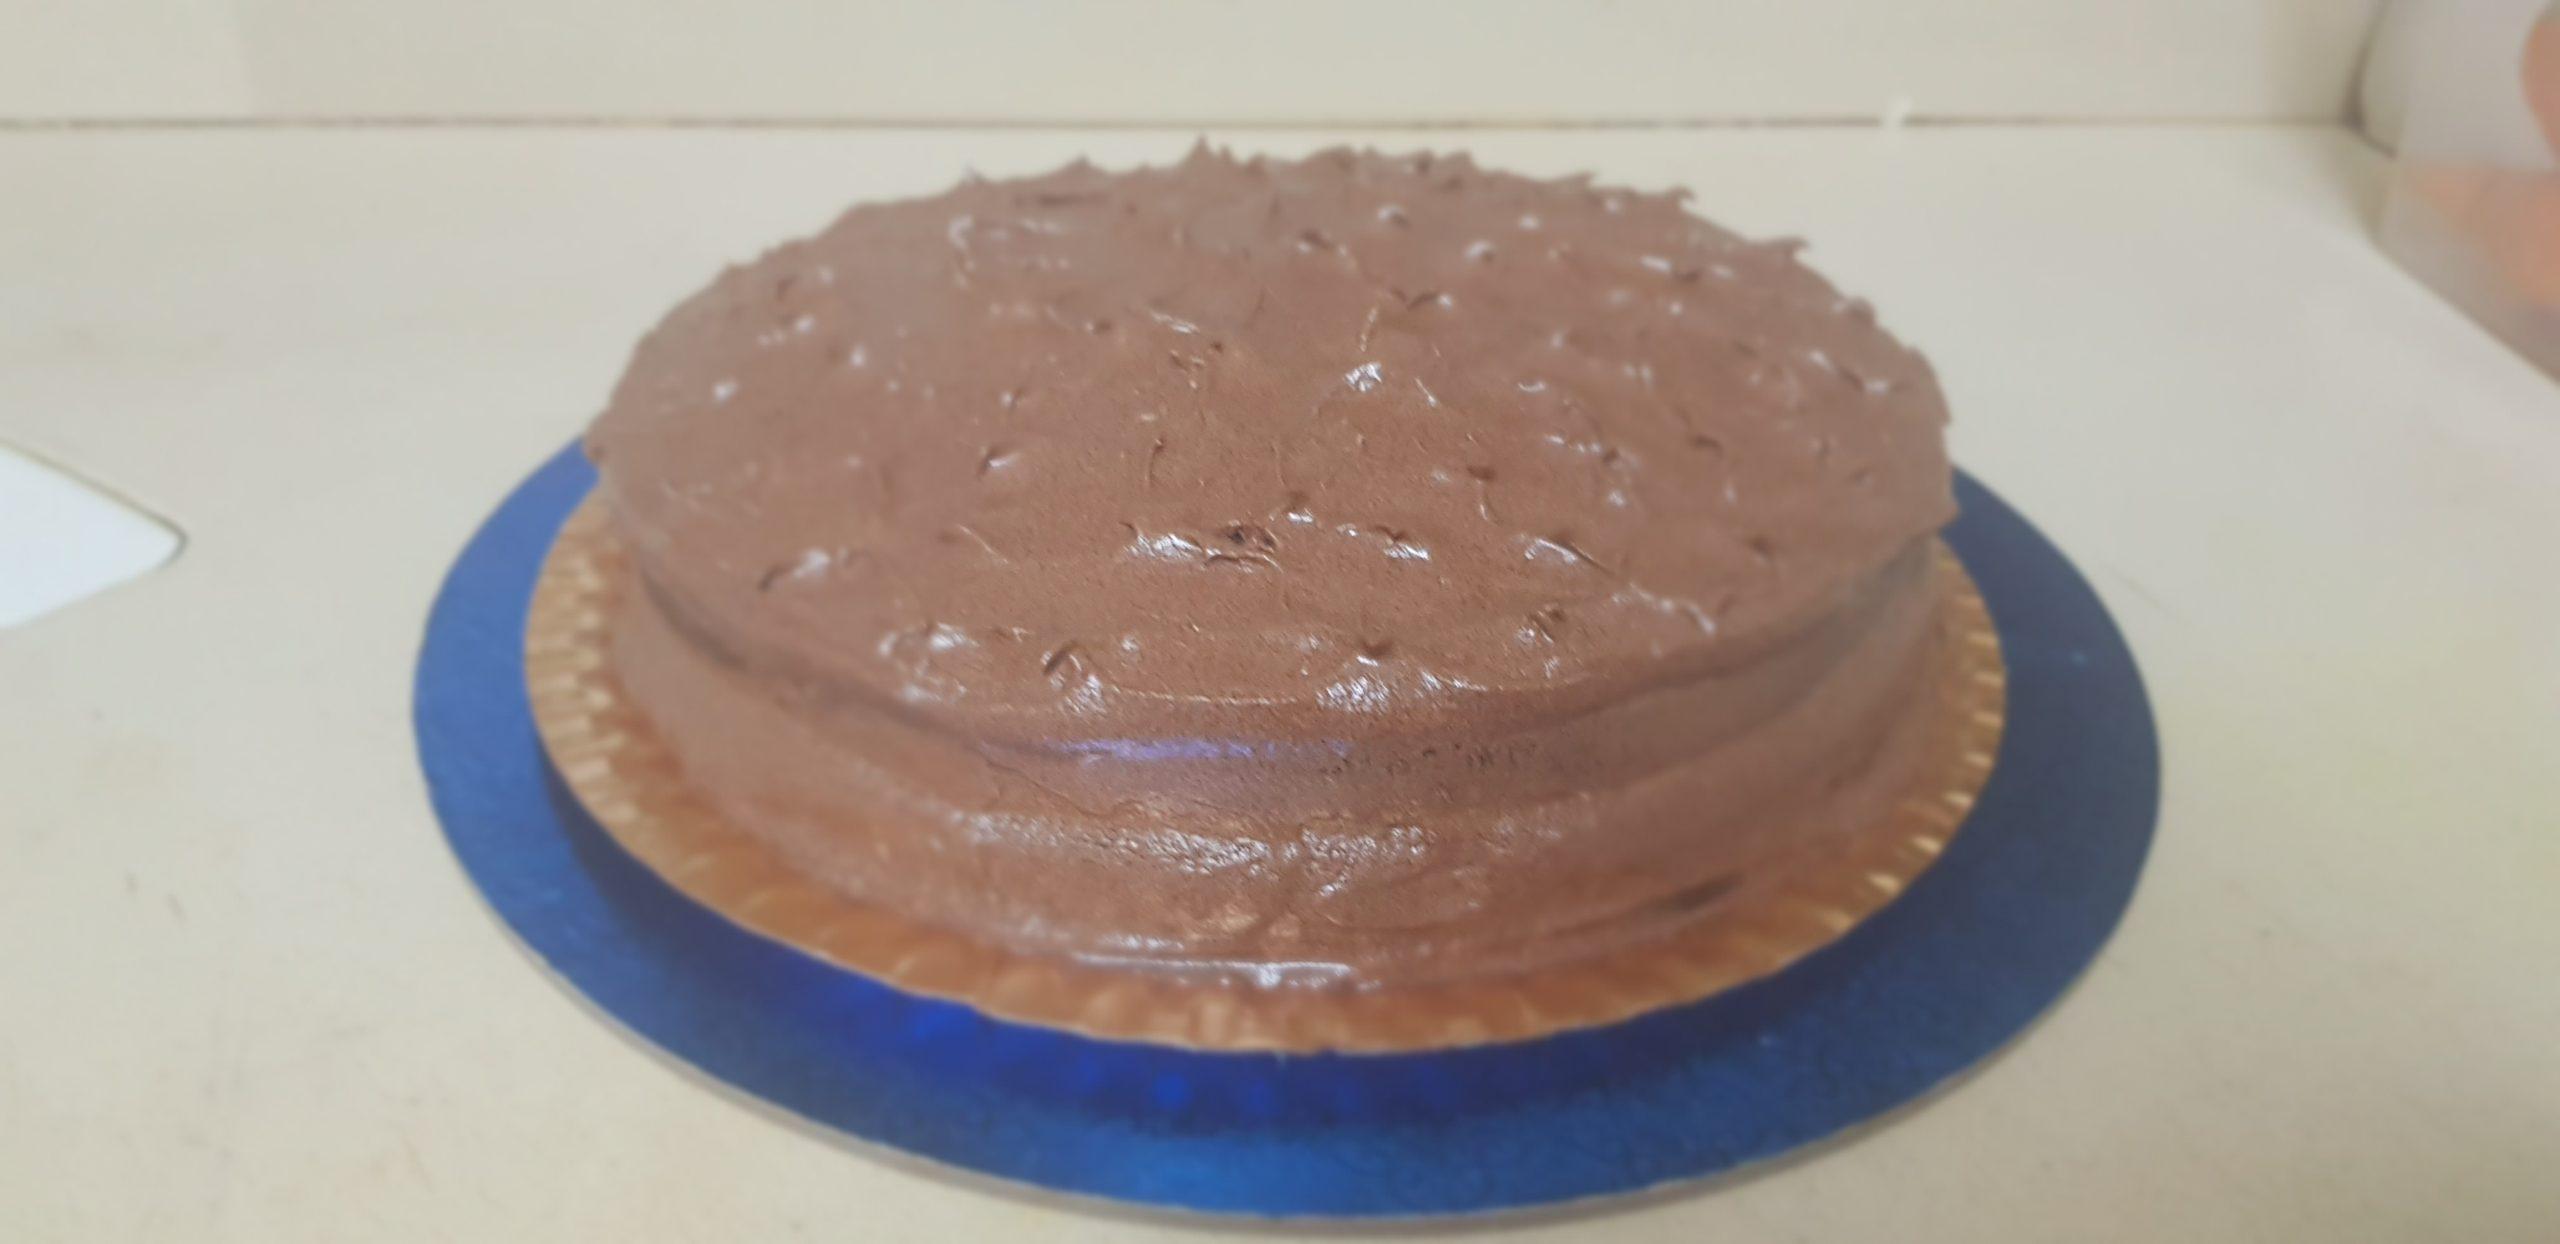 La meilleure recette de gâteau au chocolat